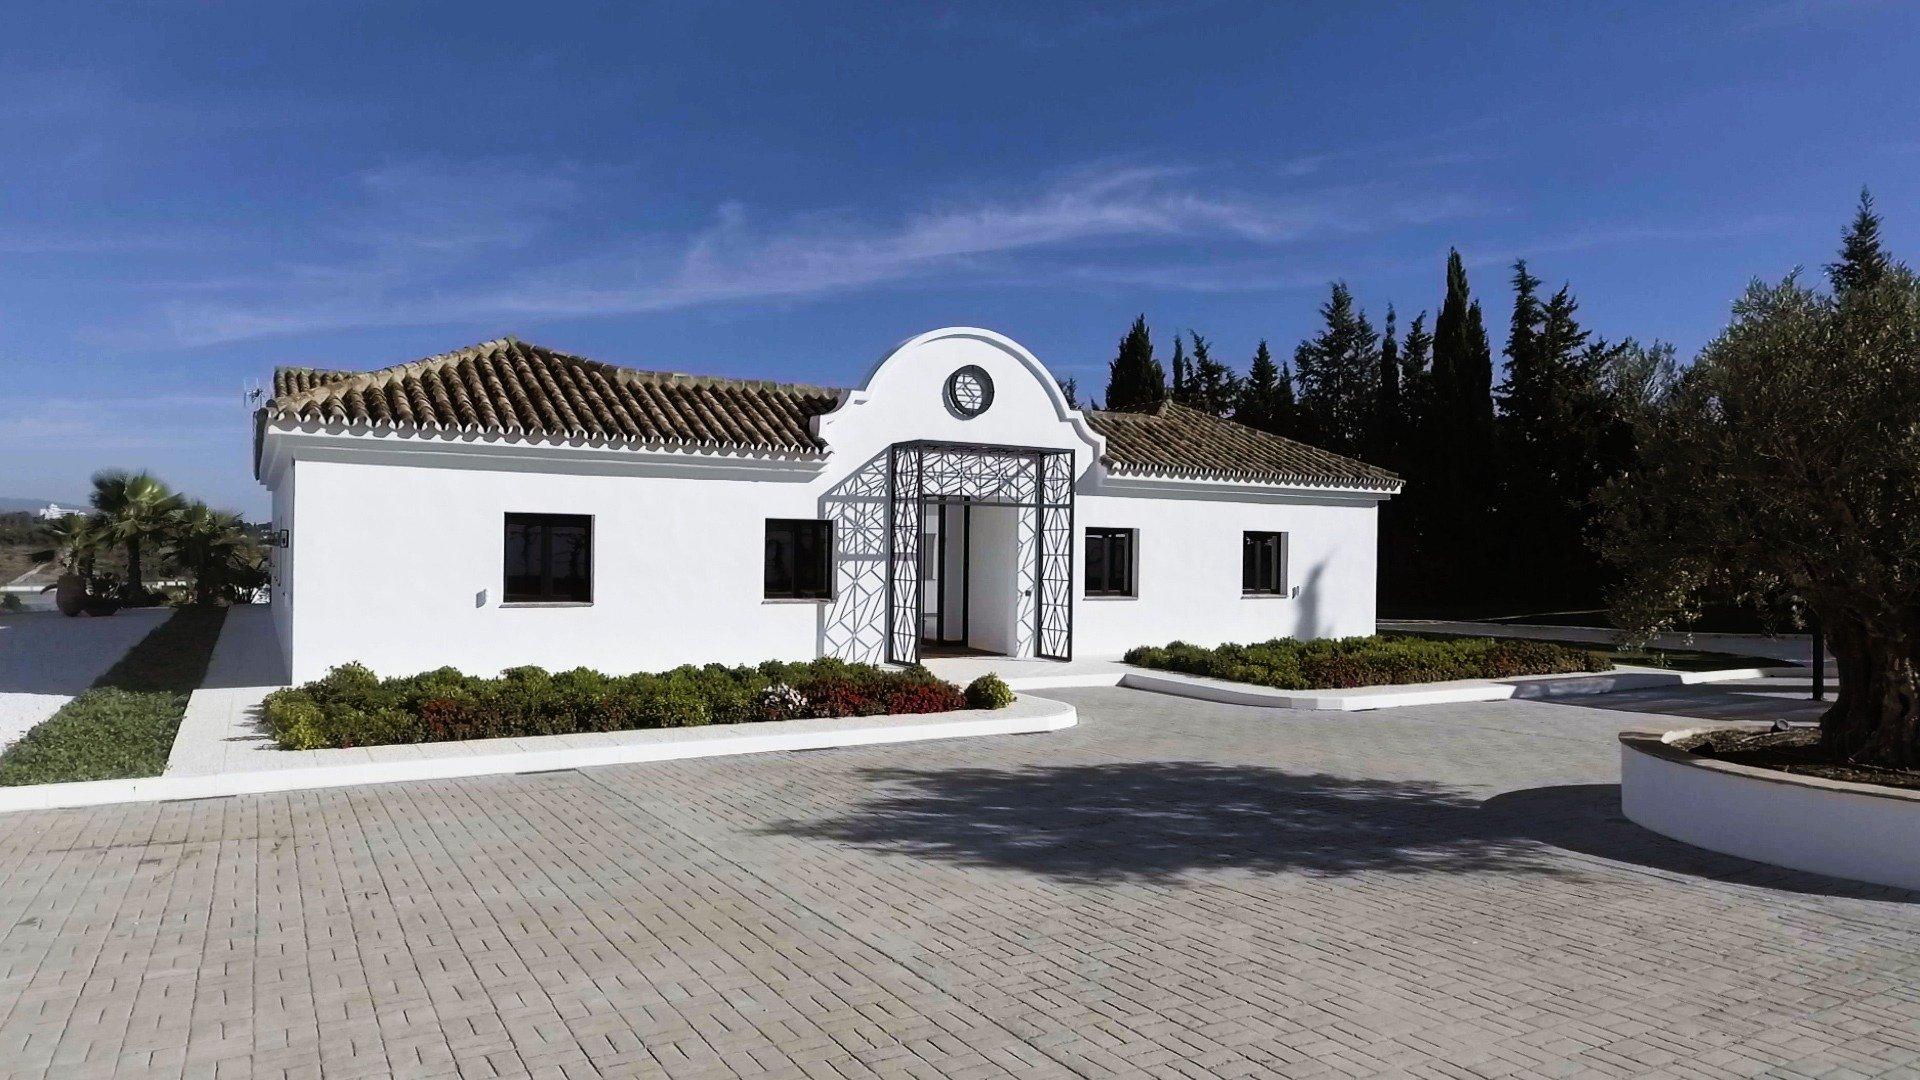 Villa in Marbella (Puerto Banus), Andalusia, Spain 1 - 11565764